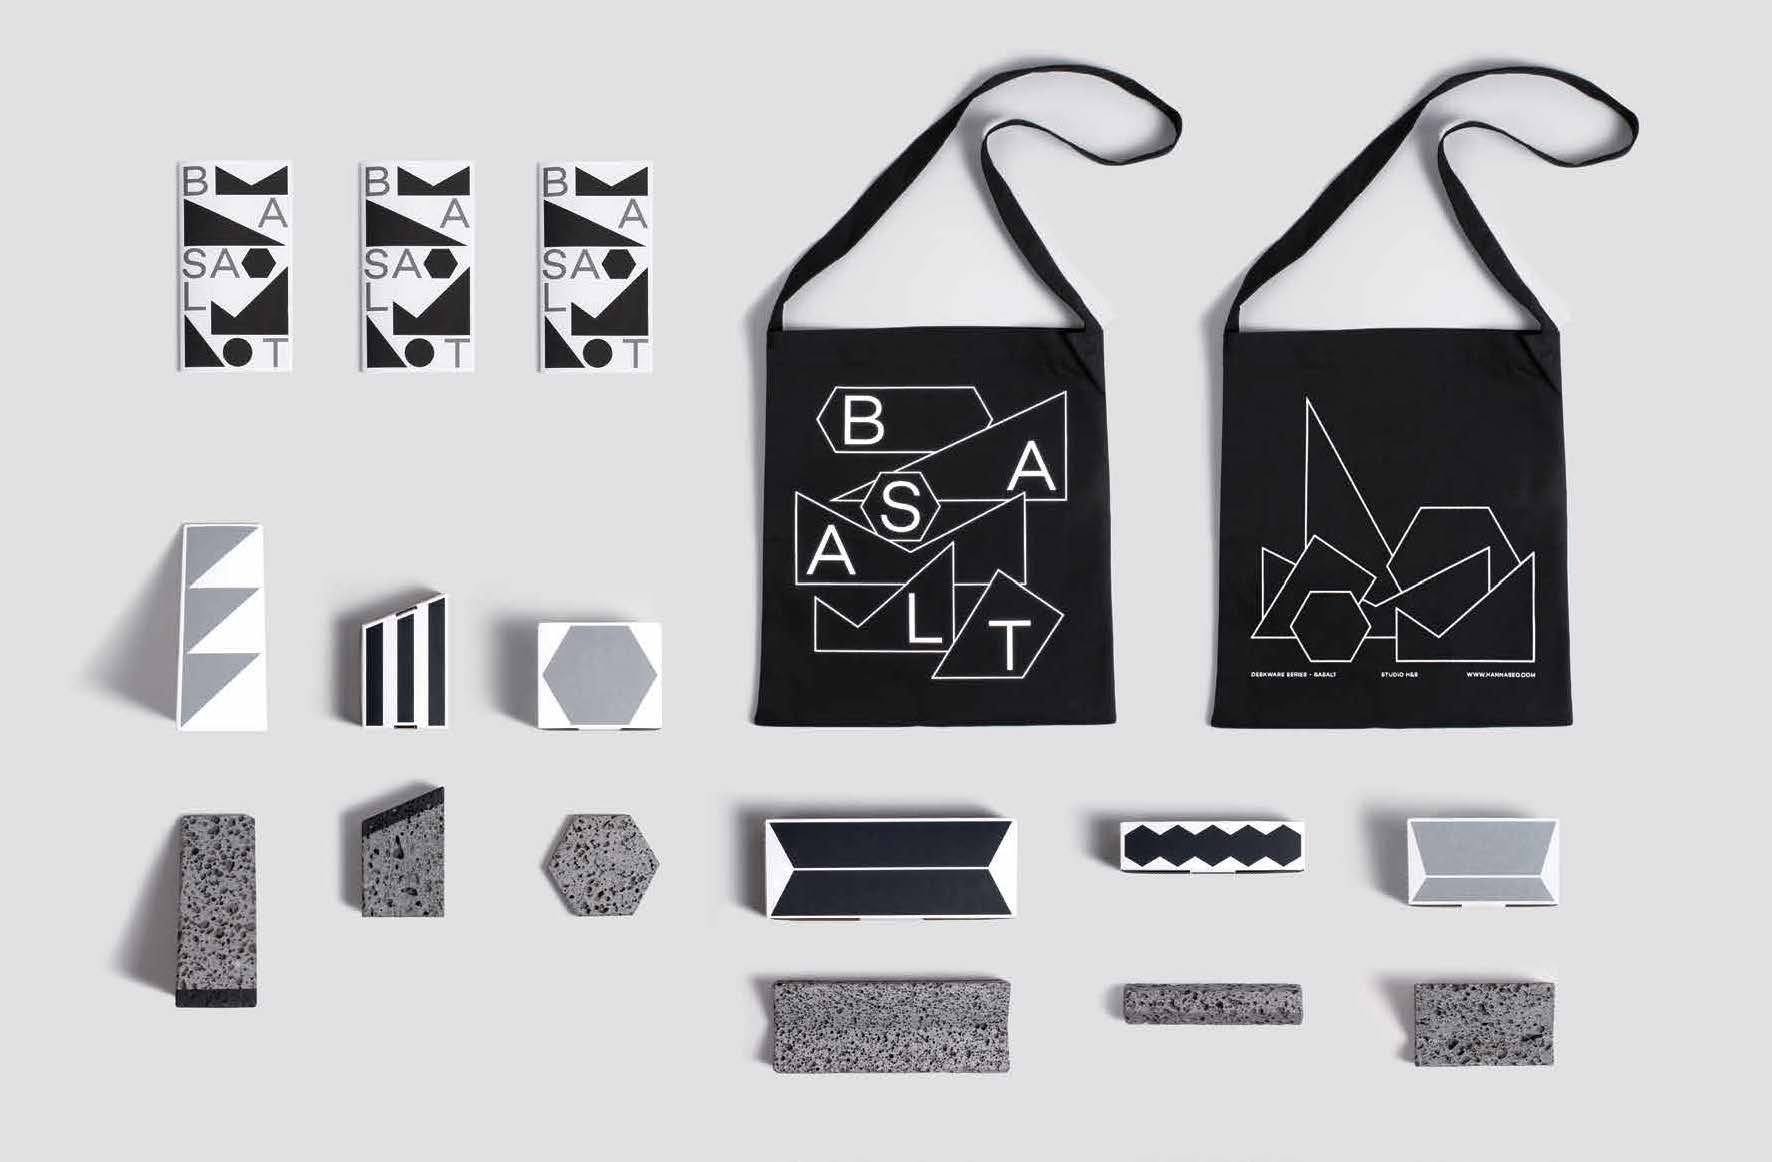 Brand design magazine international bilimsel eserler for International decor brands